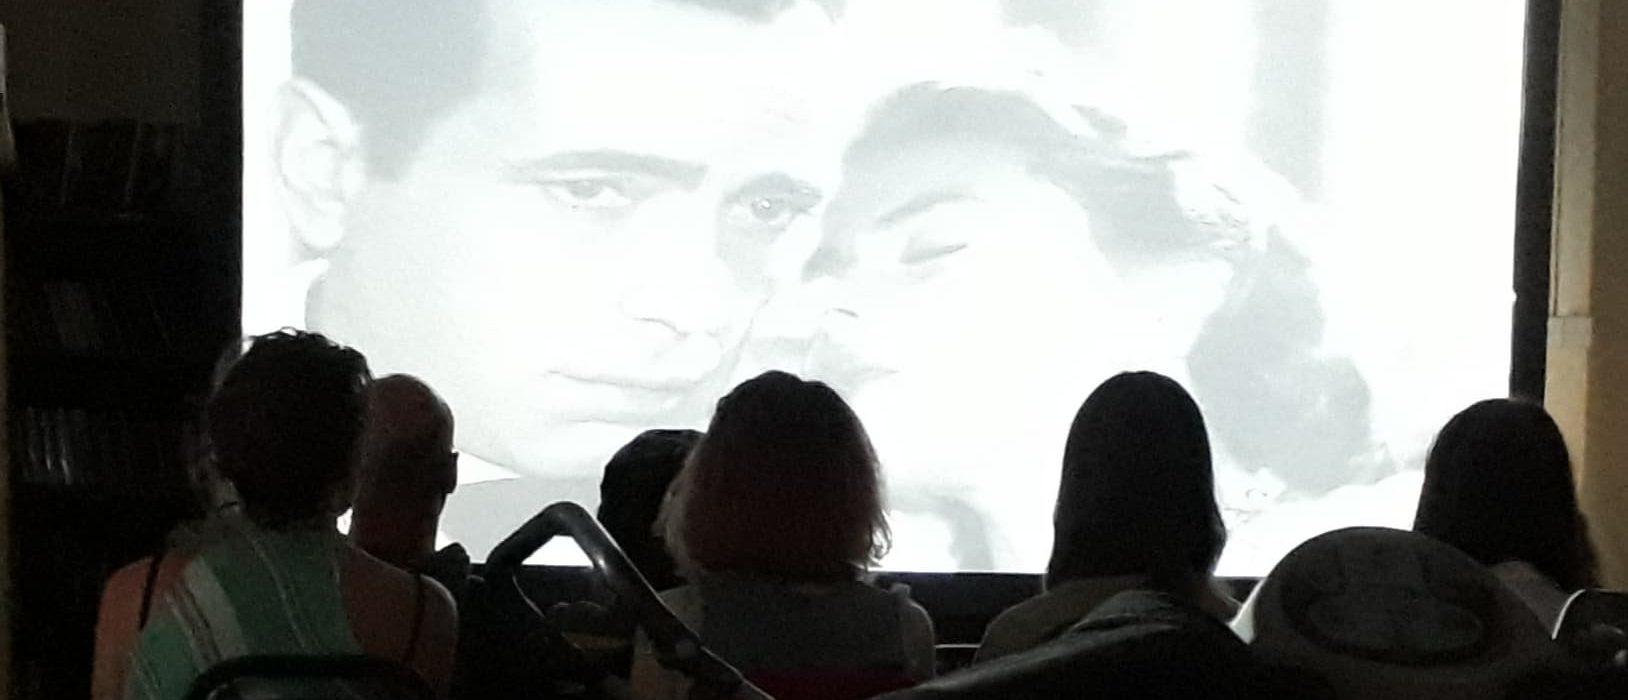 Casablanca at Sinema Sadwrn